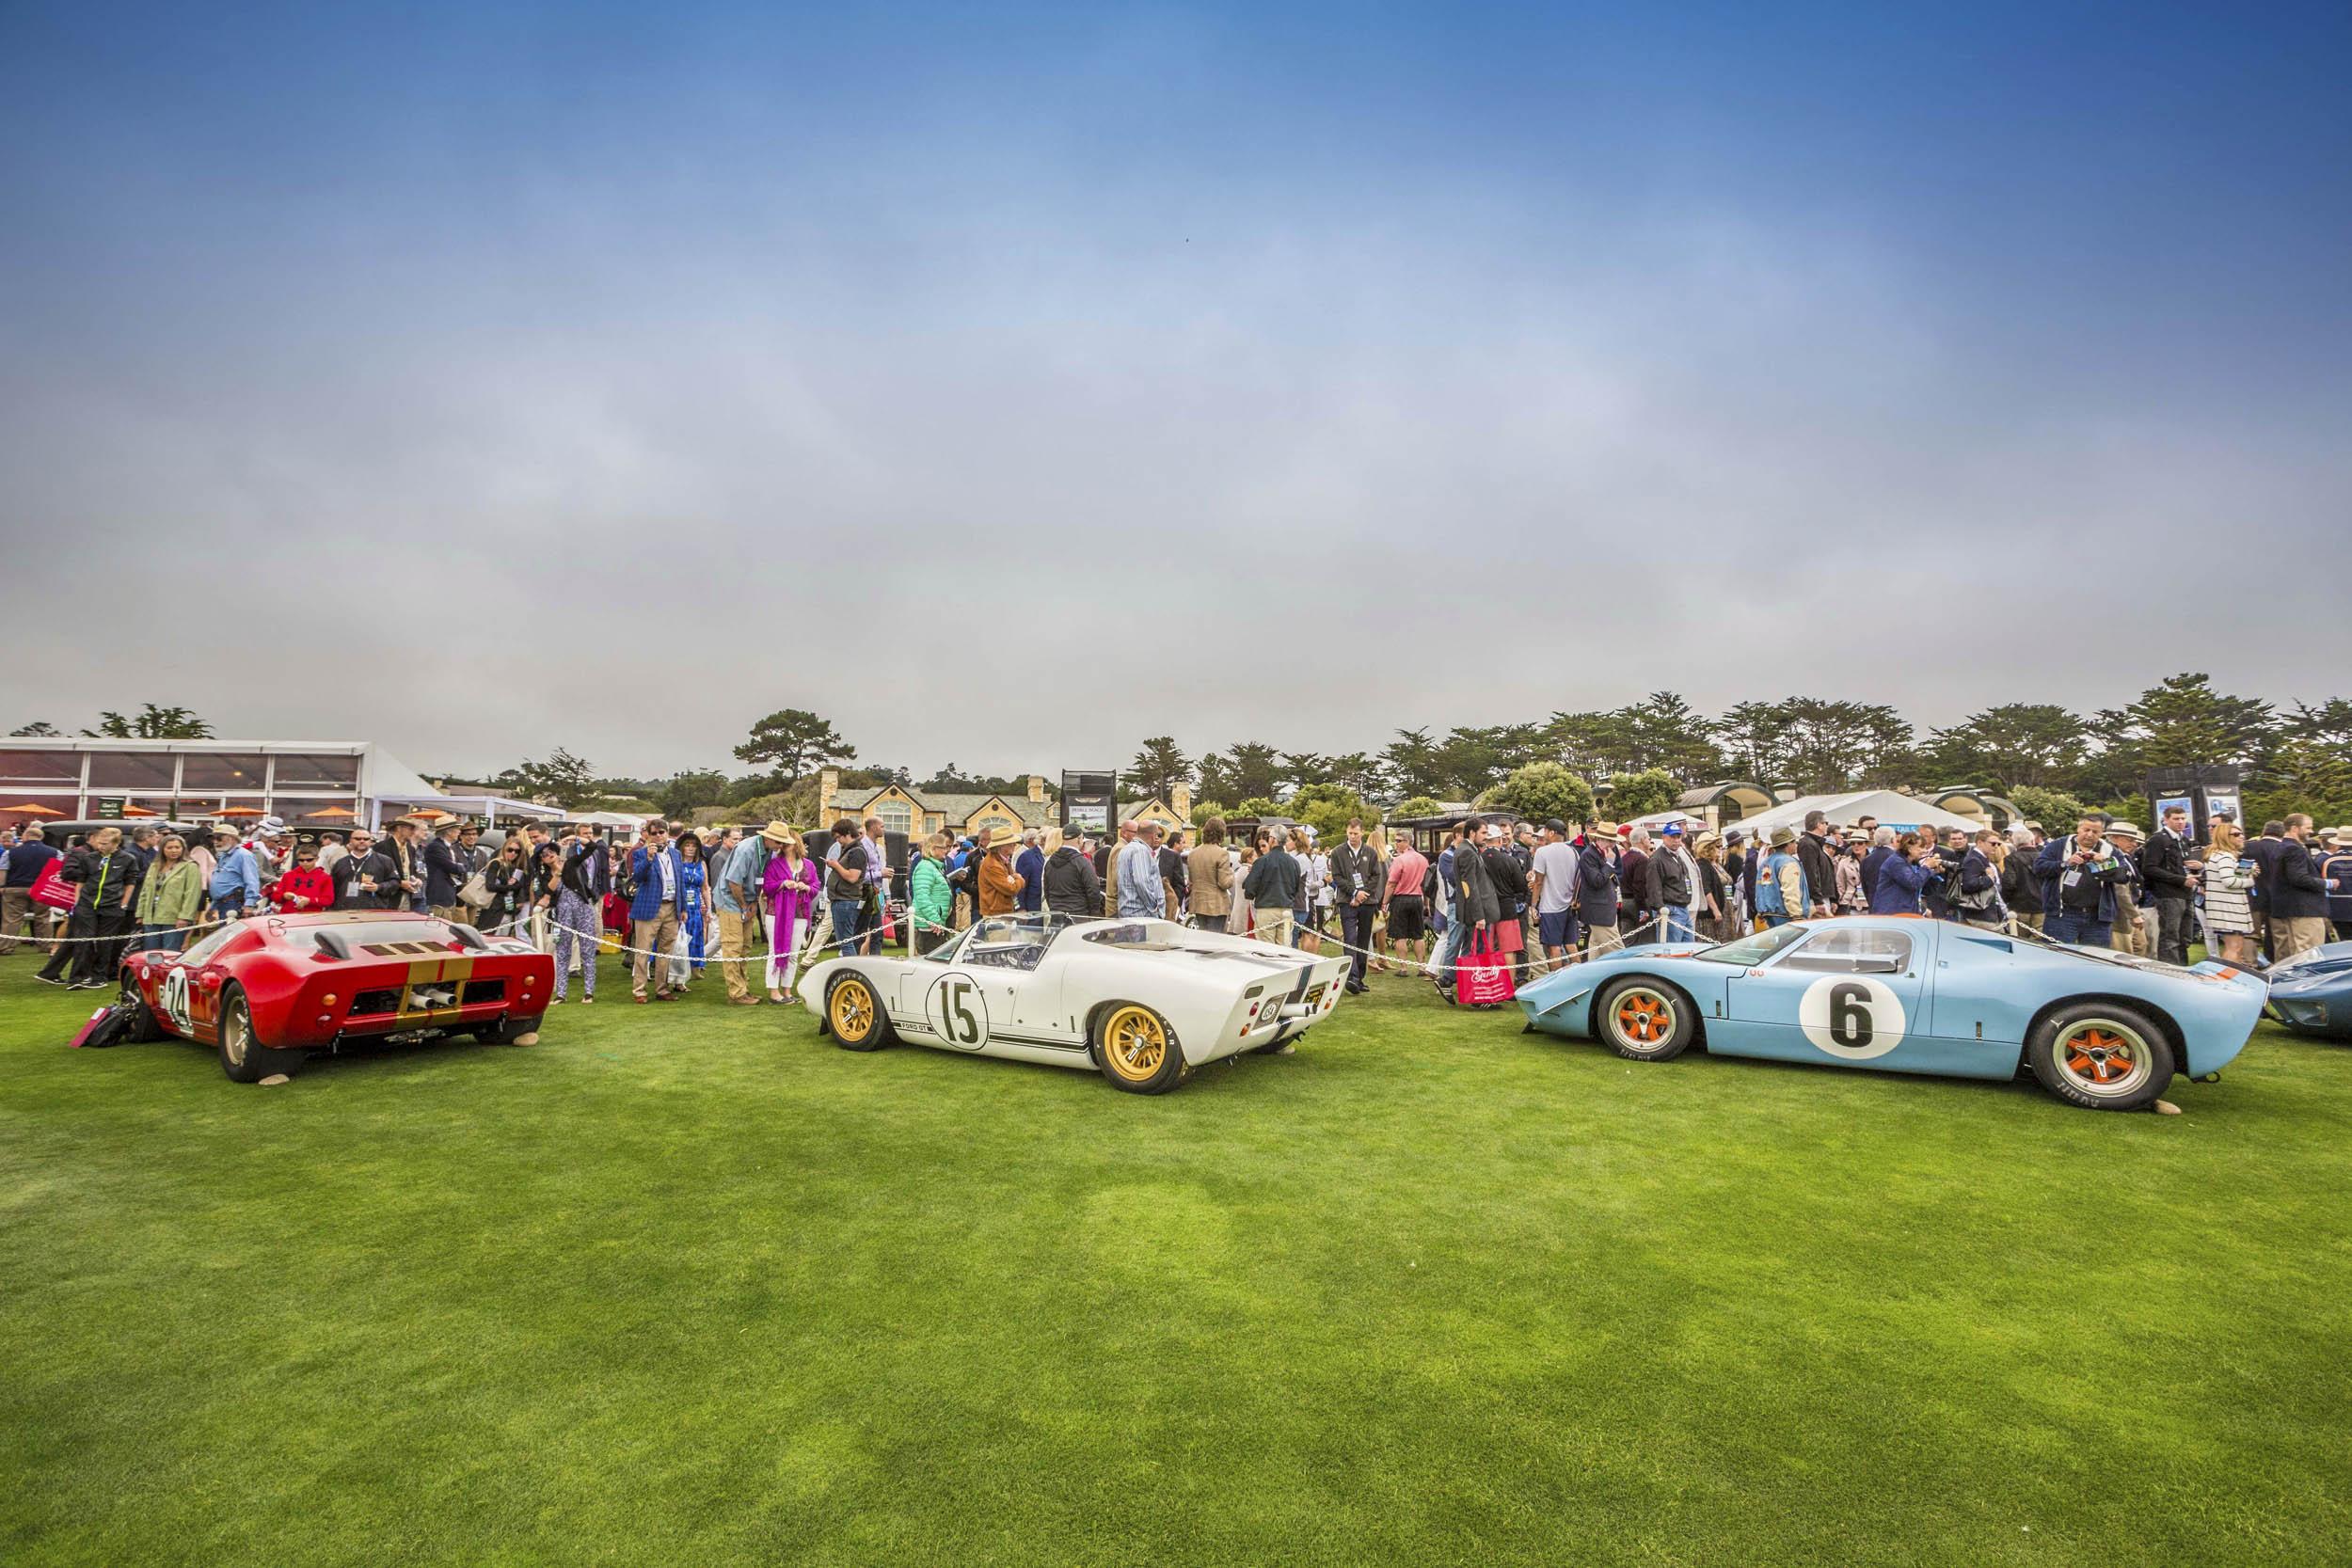 Pebble Beach Concours d'Elegance racing display